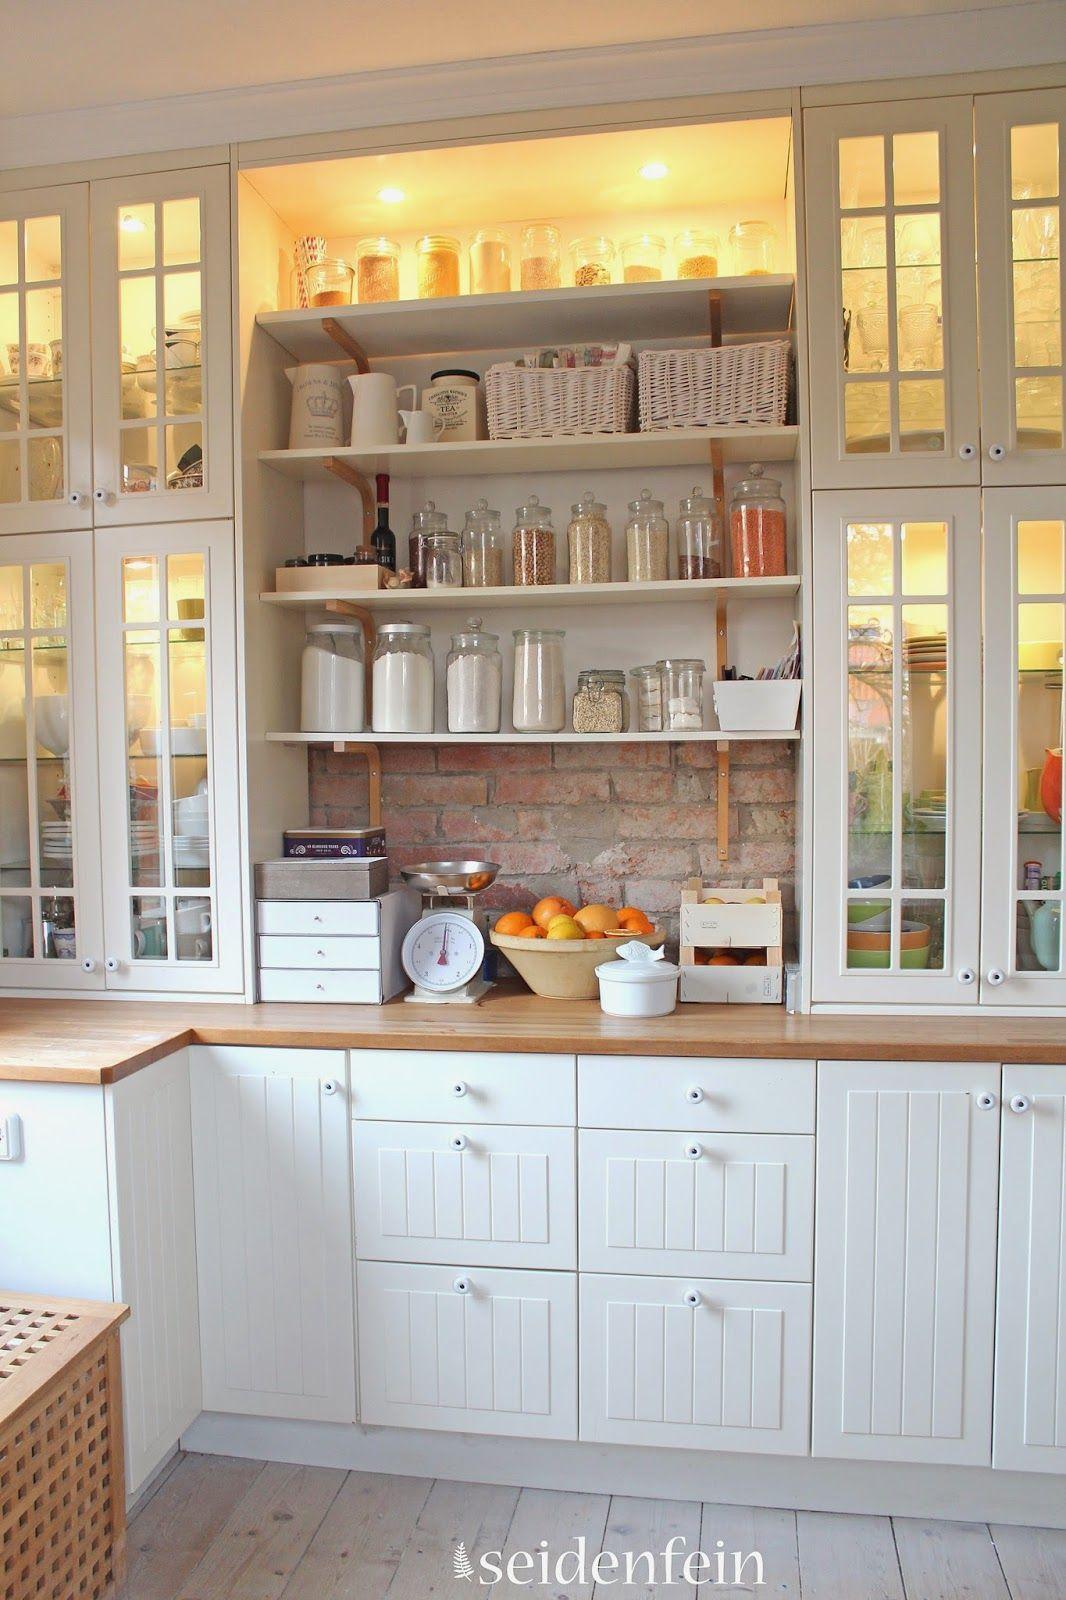 New Ikea Kitchen Cabinet Glass Shelf The Most Amazing Along With Lovely Ikea Kitchen Cabinet Glass Shelf Fo Charming Kitchen Kitchen Design Kitchen Interior